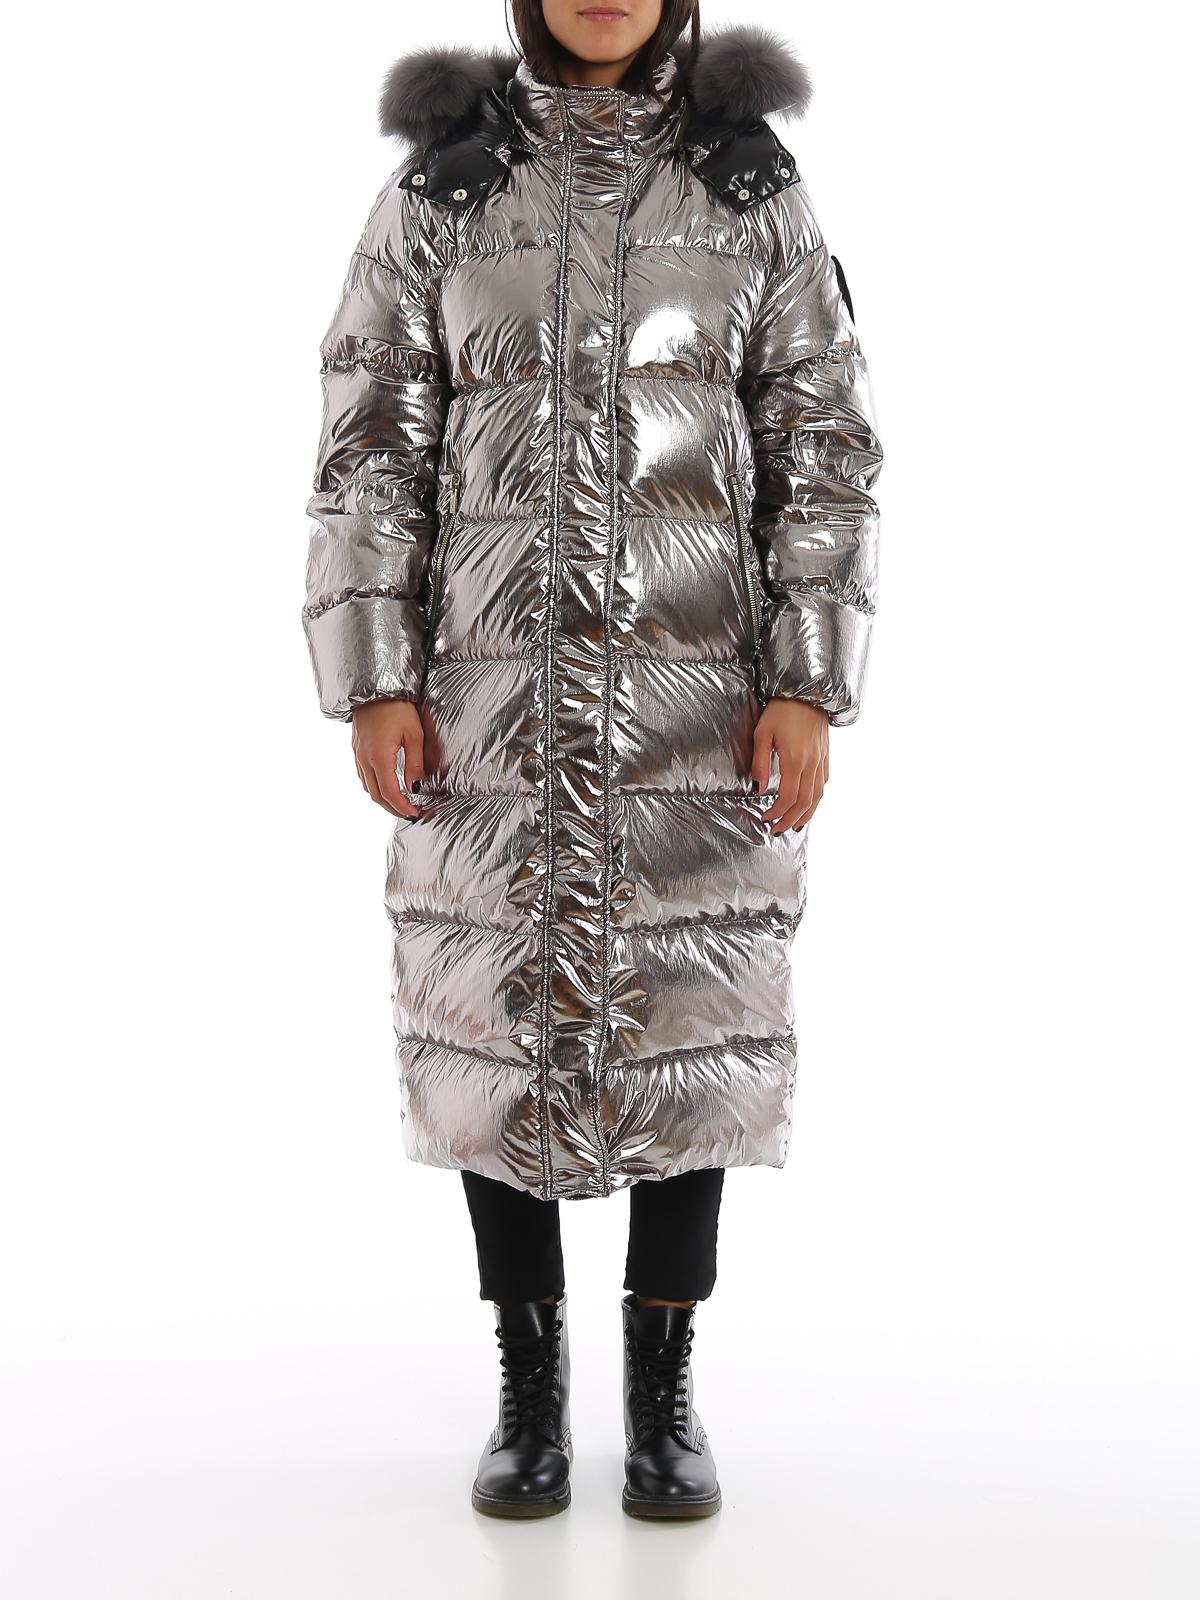 Ciesse Piumino metallizzato Leicas cappotti imbottiti